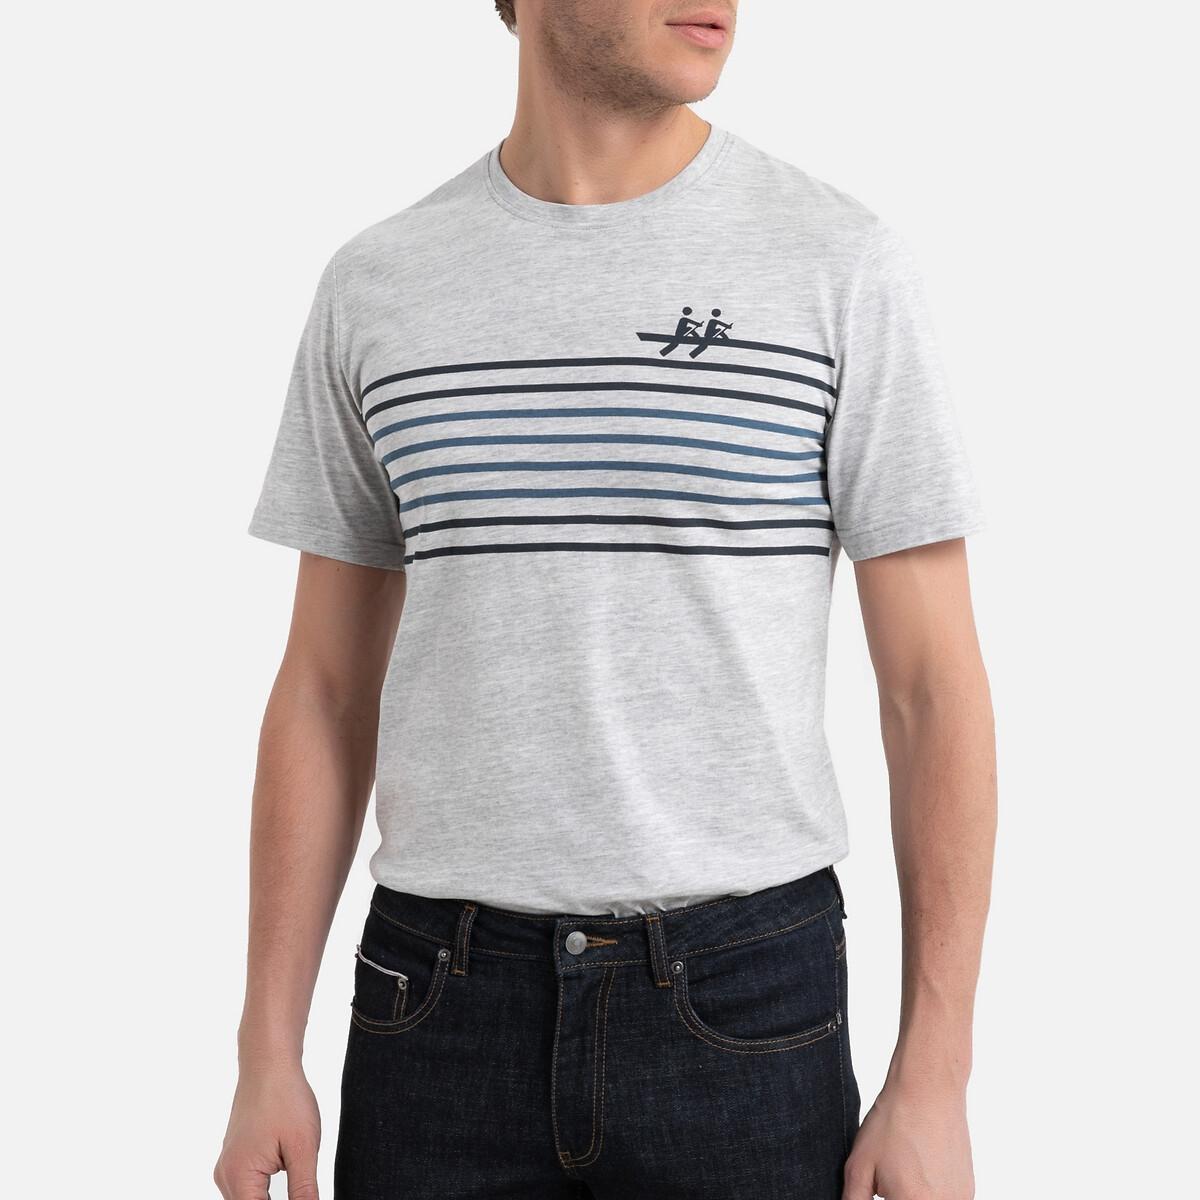 Футболка La Redoute С круглым вырезом короткими рукавами и рисунком спереди 3XL серый футболка la redoute с круглым вырезом и принтом спереди 3 года 94 см серый